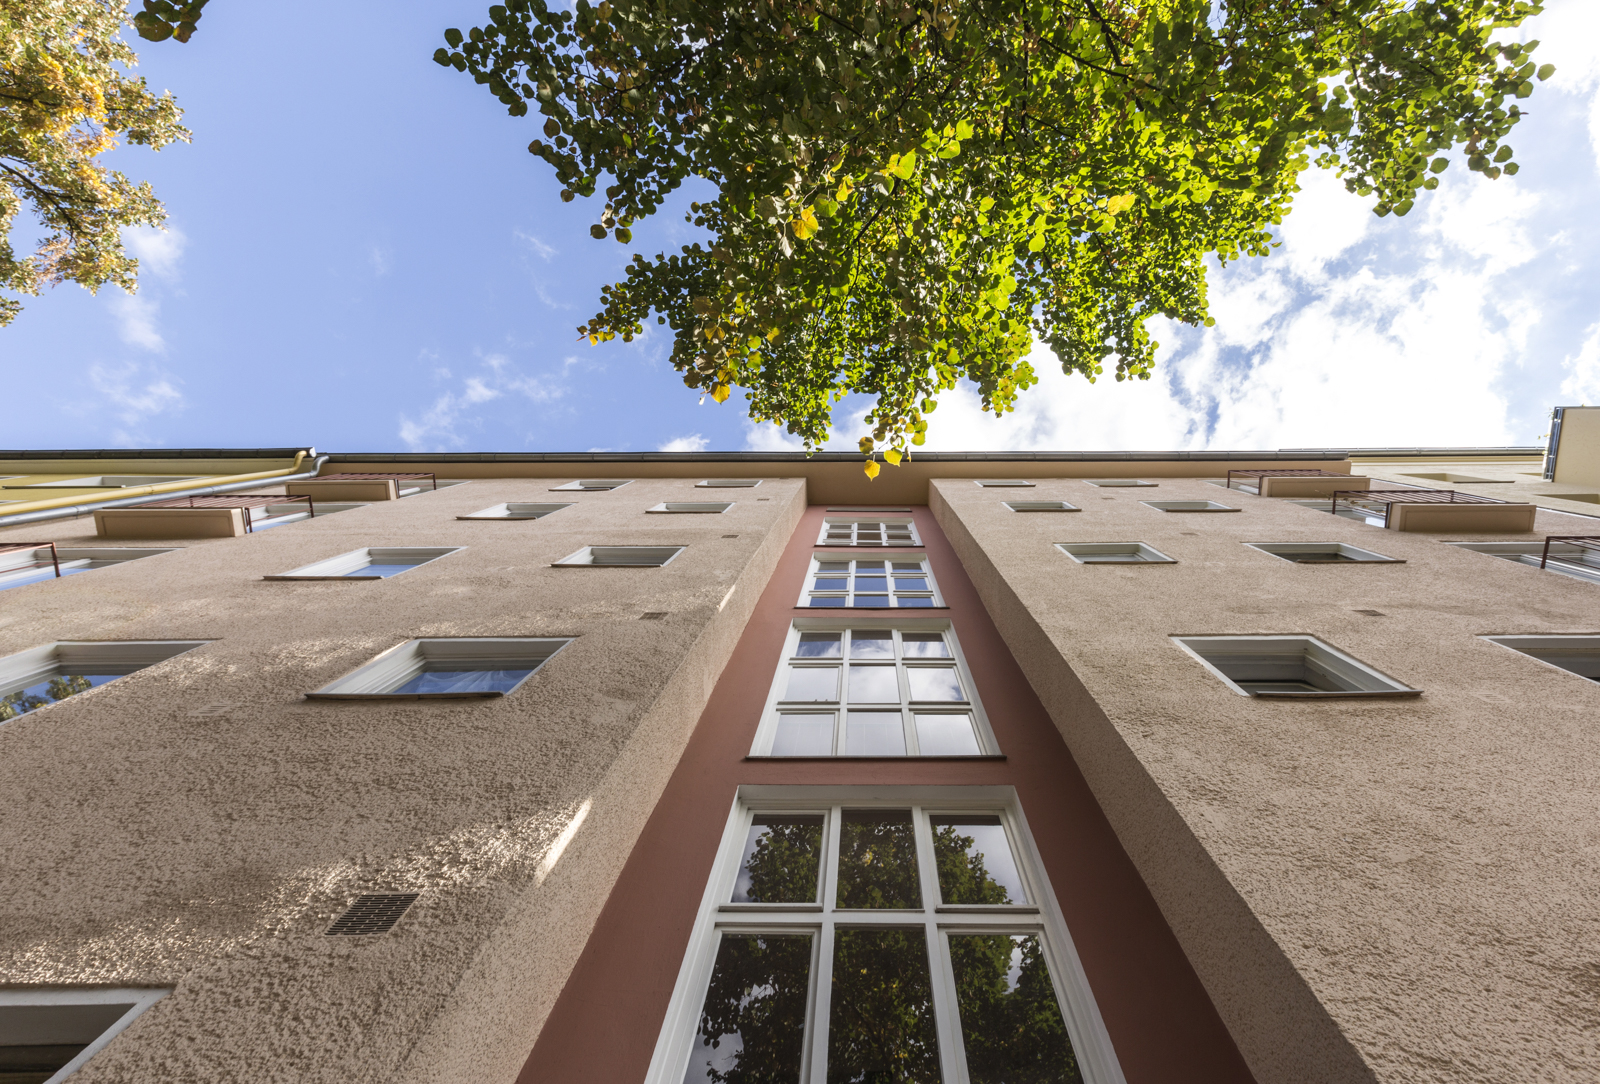 Ingo_Lawaczeck_Mähren_Pannierstraße-3